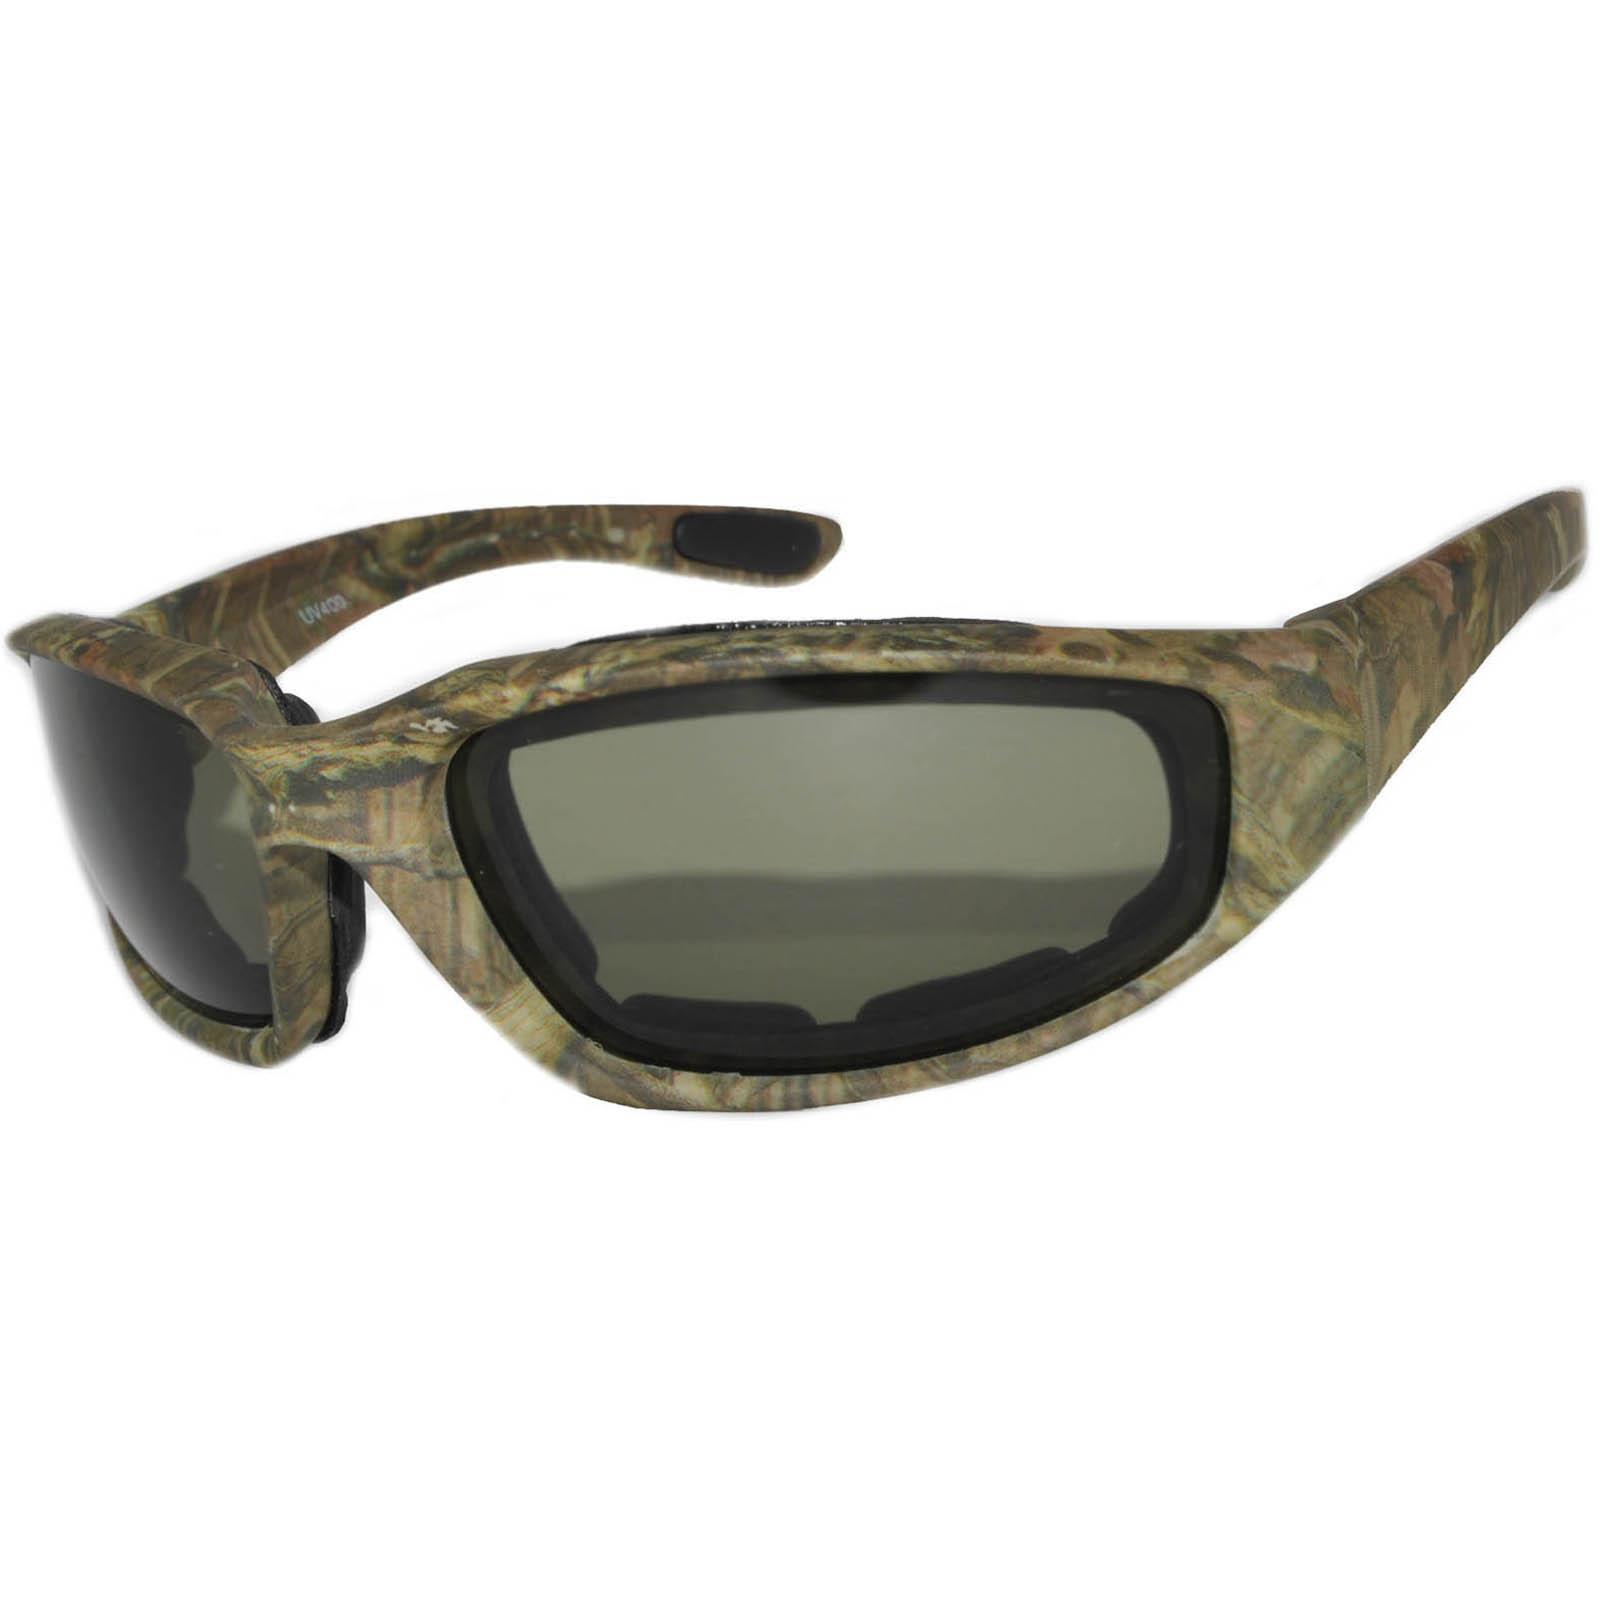 OWL Eyewear Motorcycle Padded Glasses Camo#1 Frame Green Lens (One ...